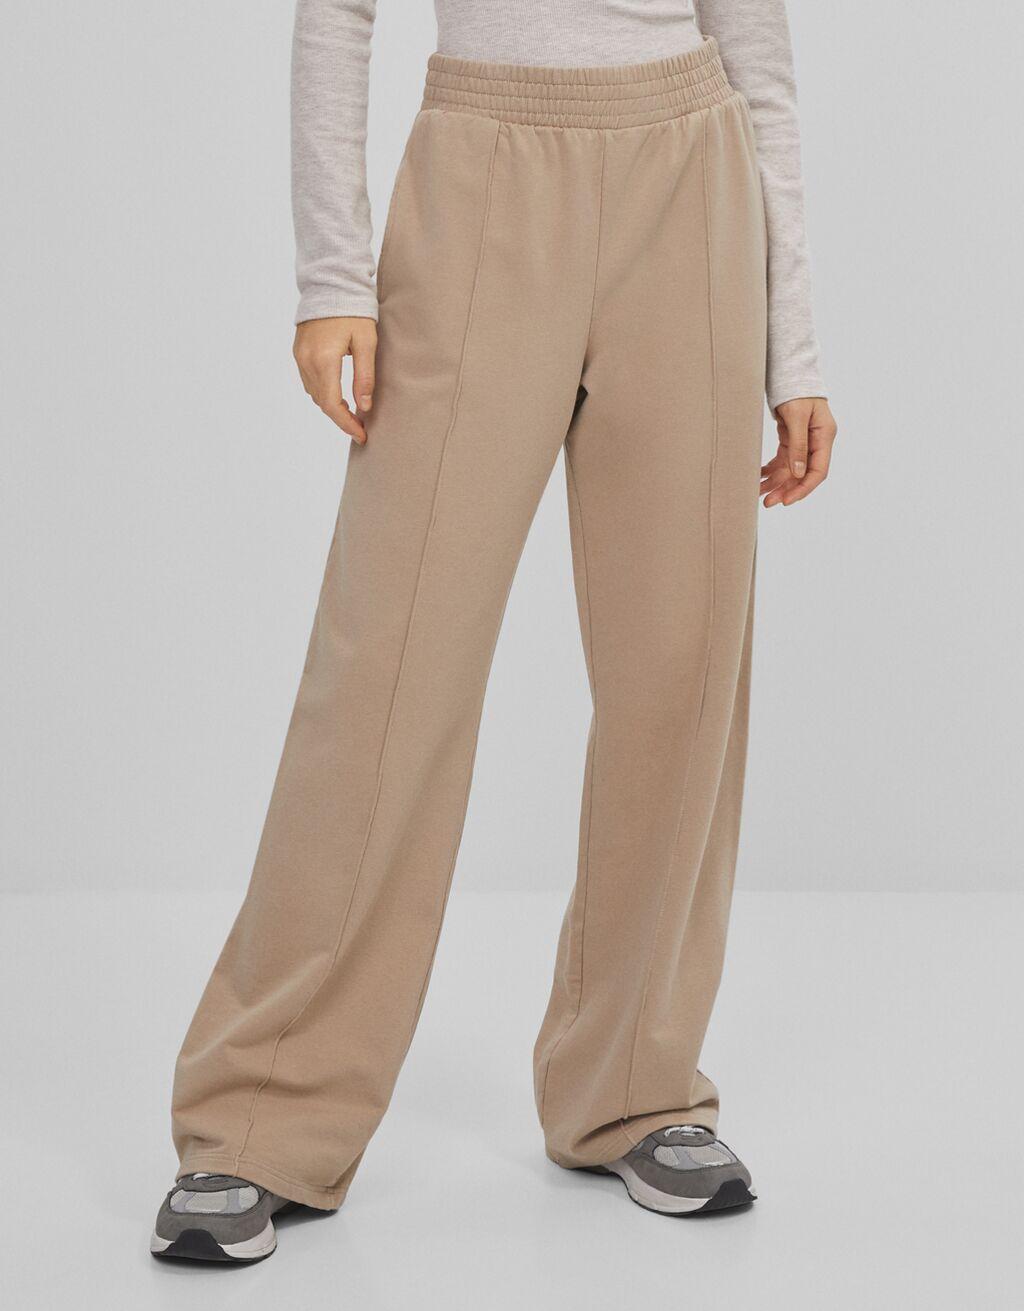 Pantalón wide leg lavado